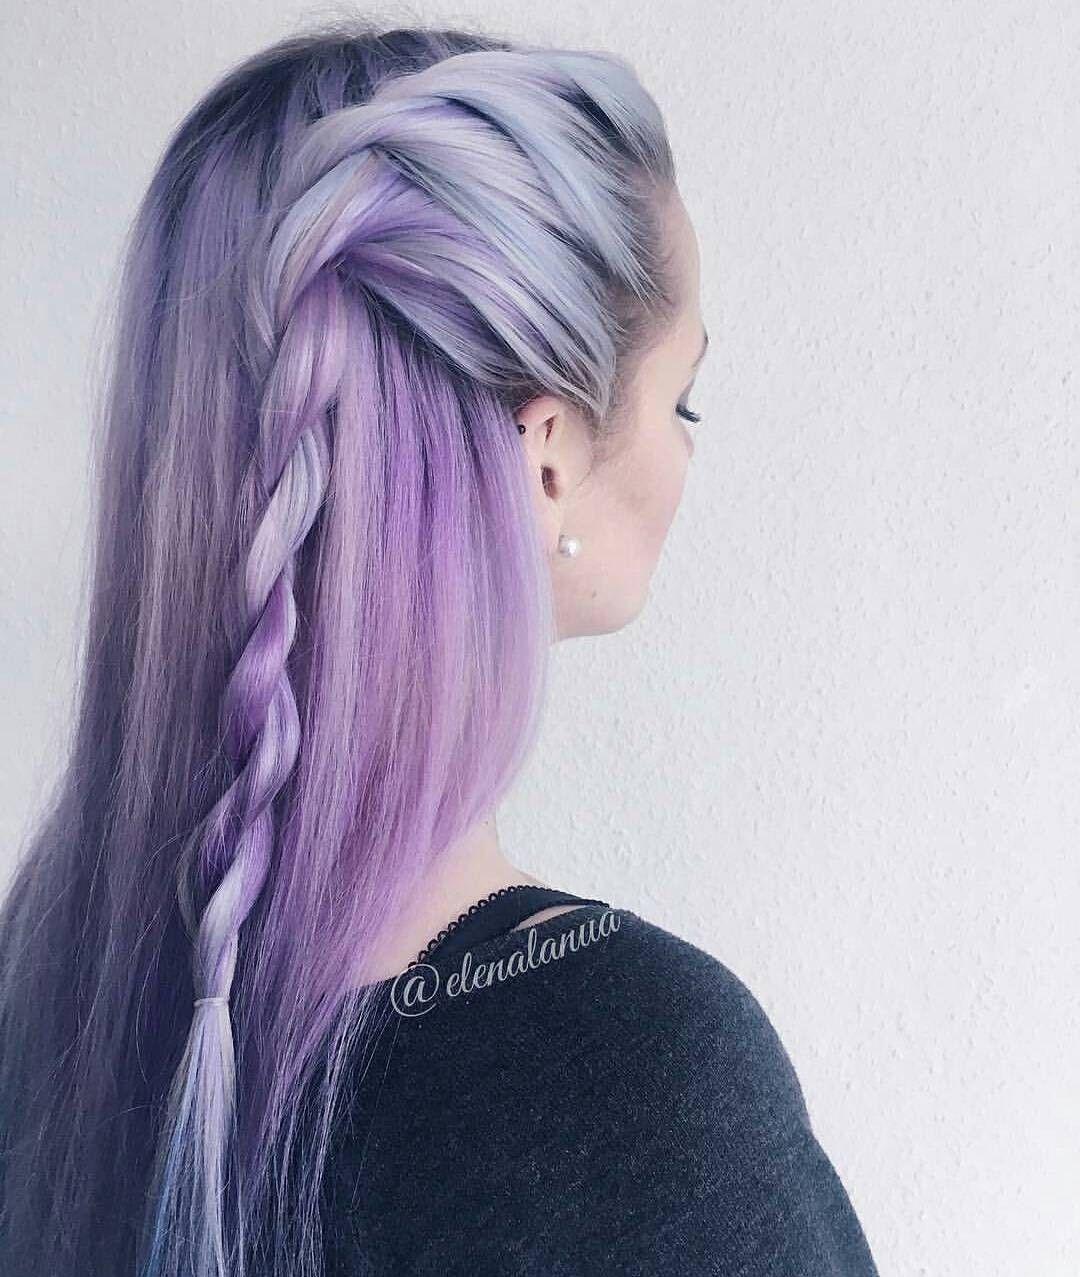 Peinados colores fantasia